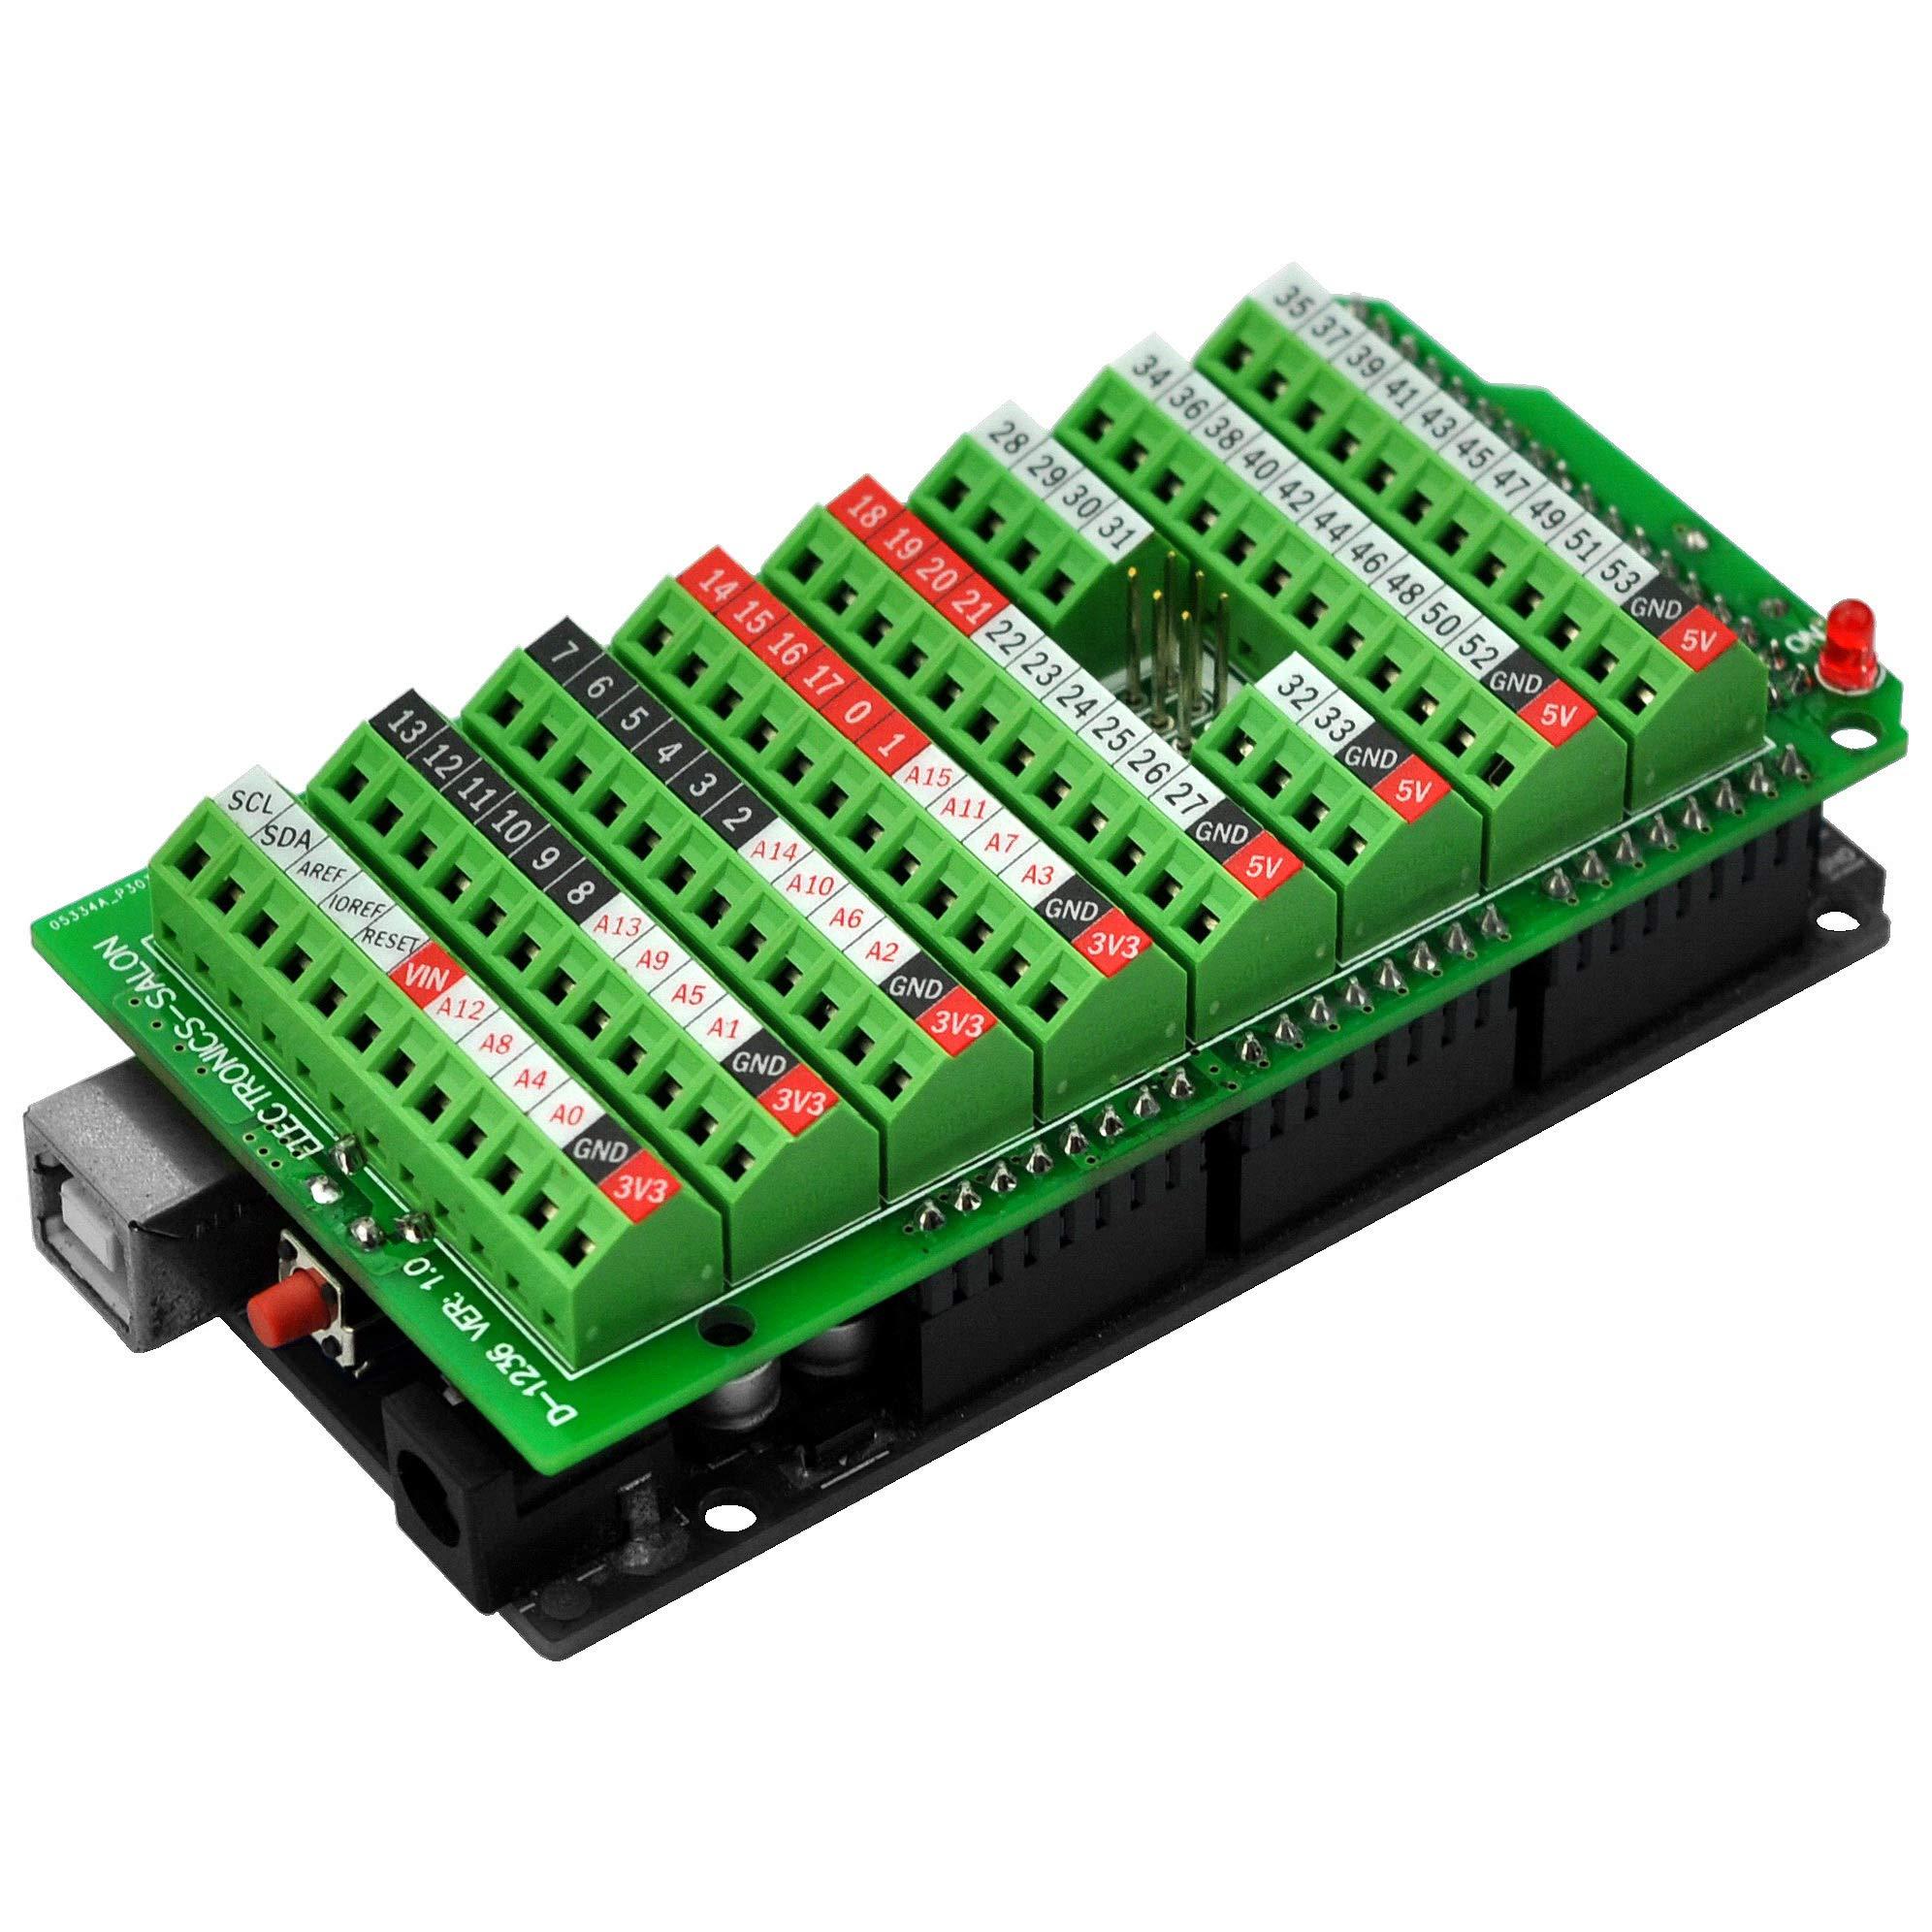 Electronics Salon Terminal Breakout Arduino MEGA 2560